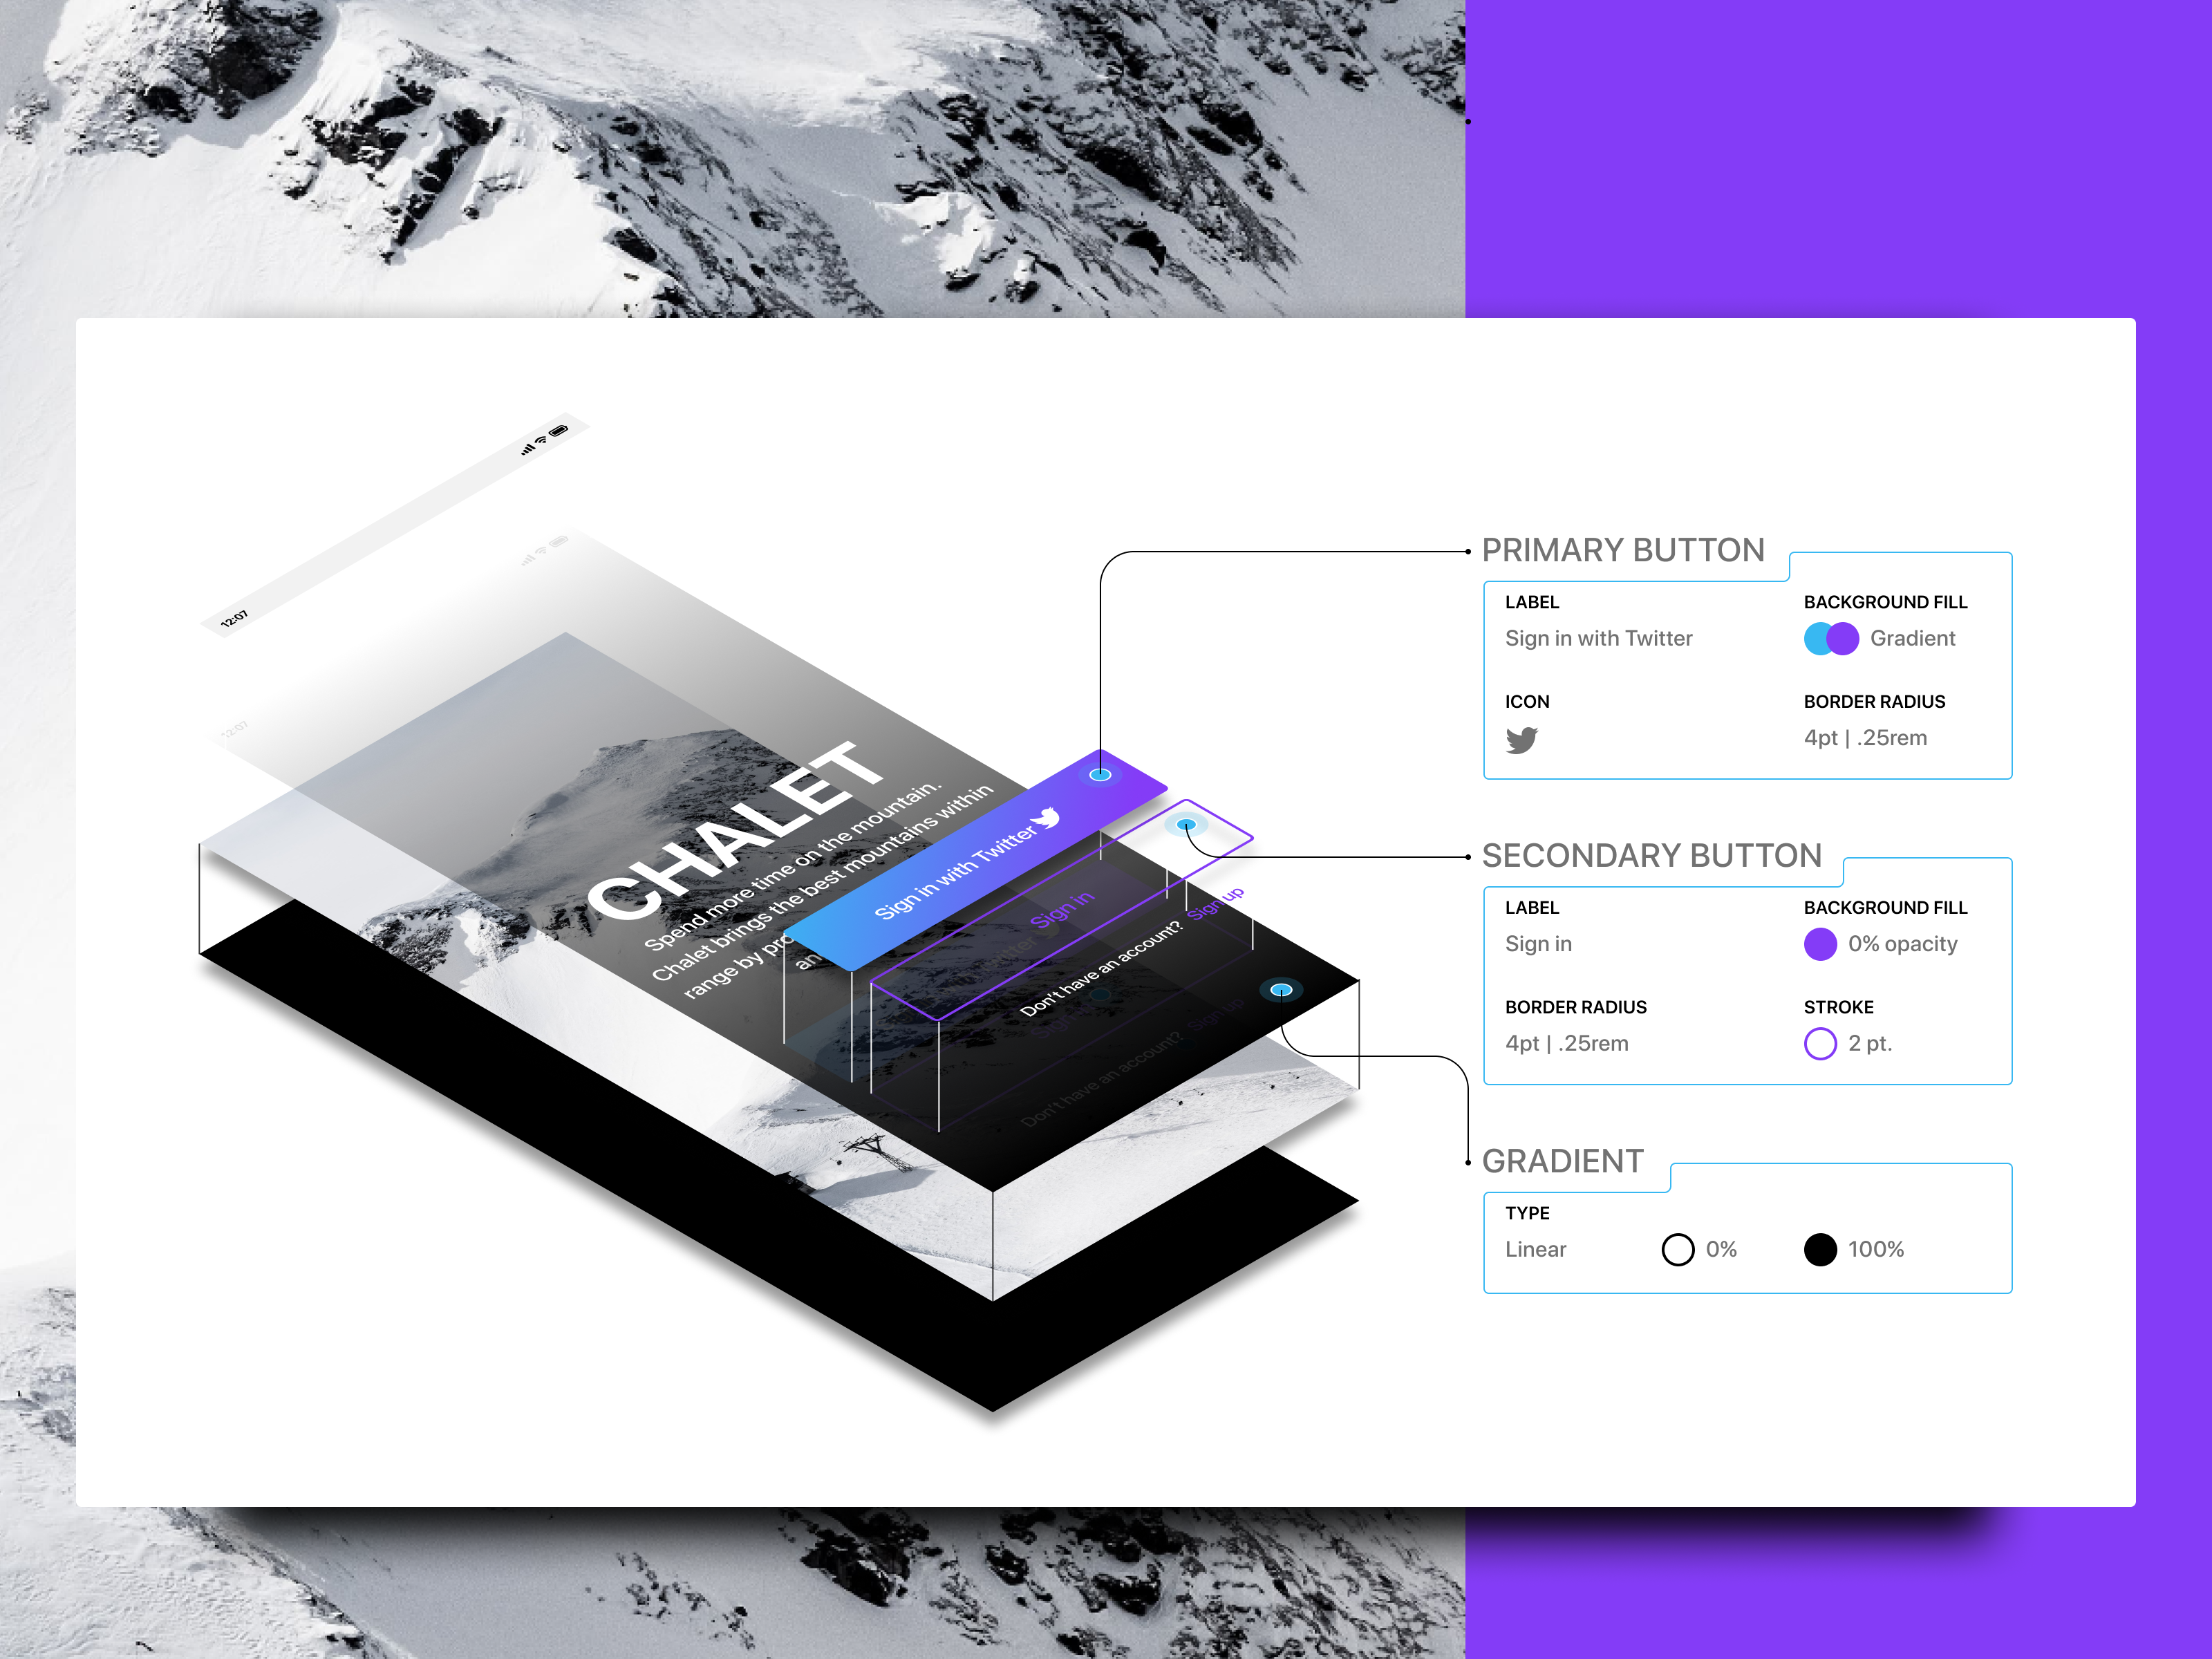 Chalet deconstruct 2x #ios #mobile #design #webdesign #ui